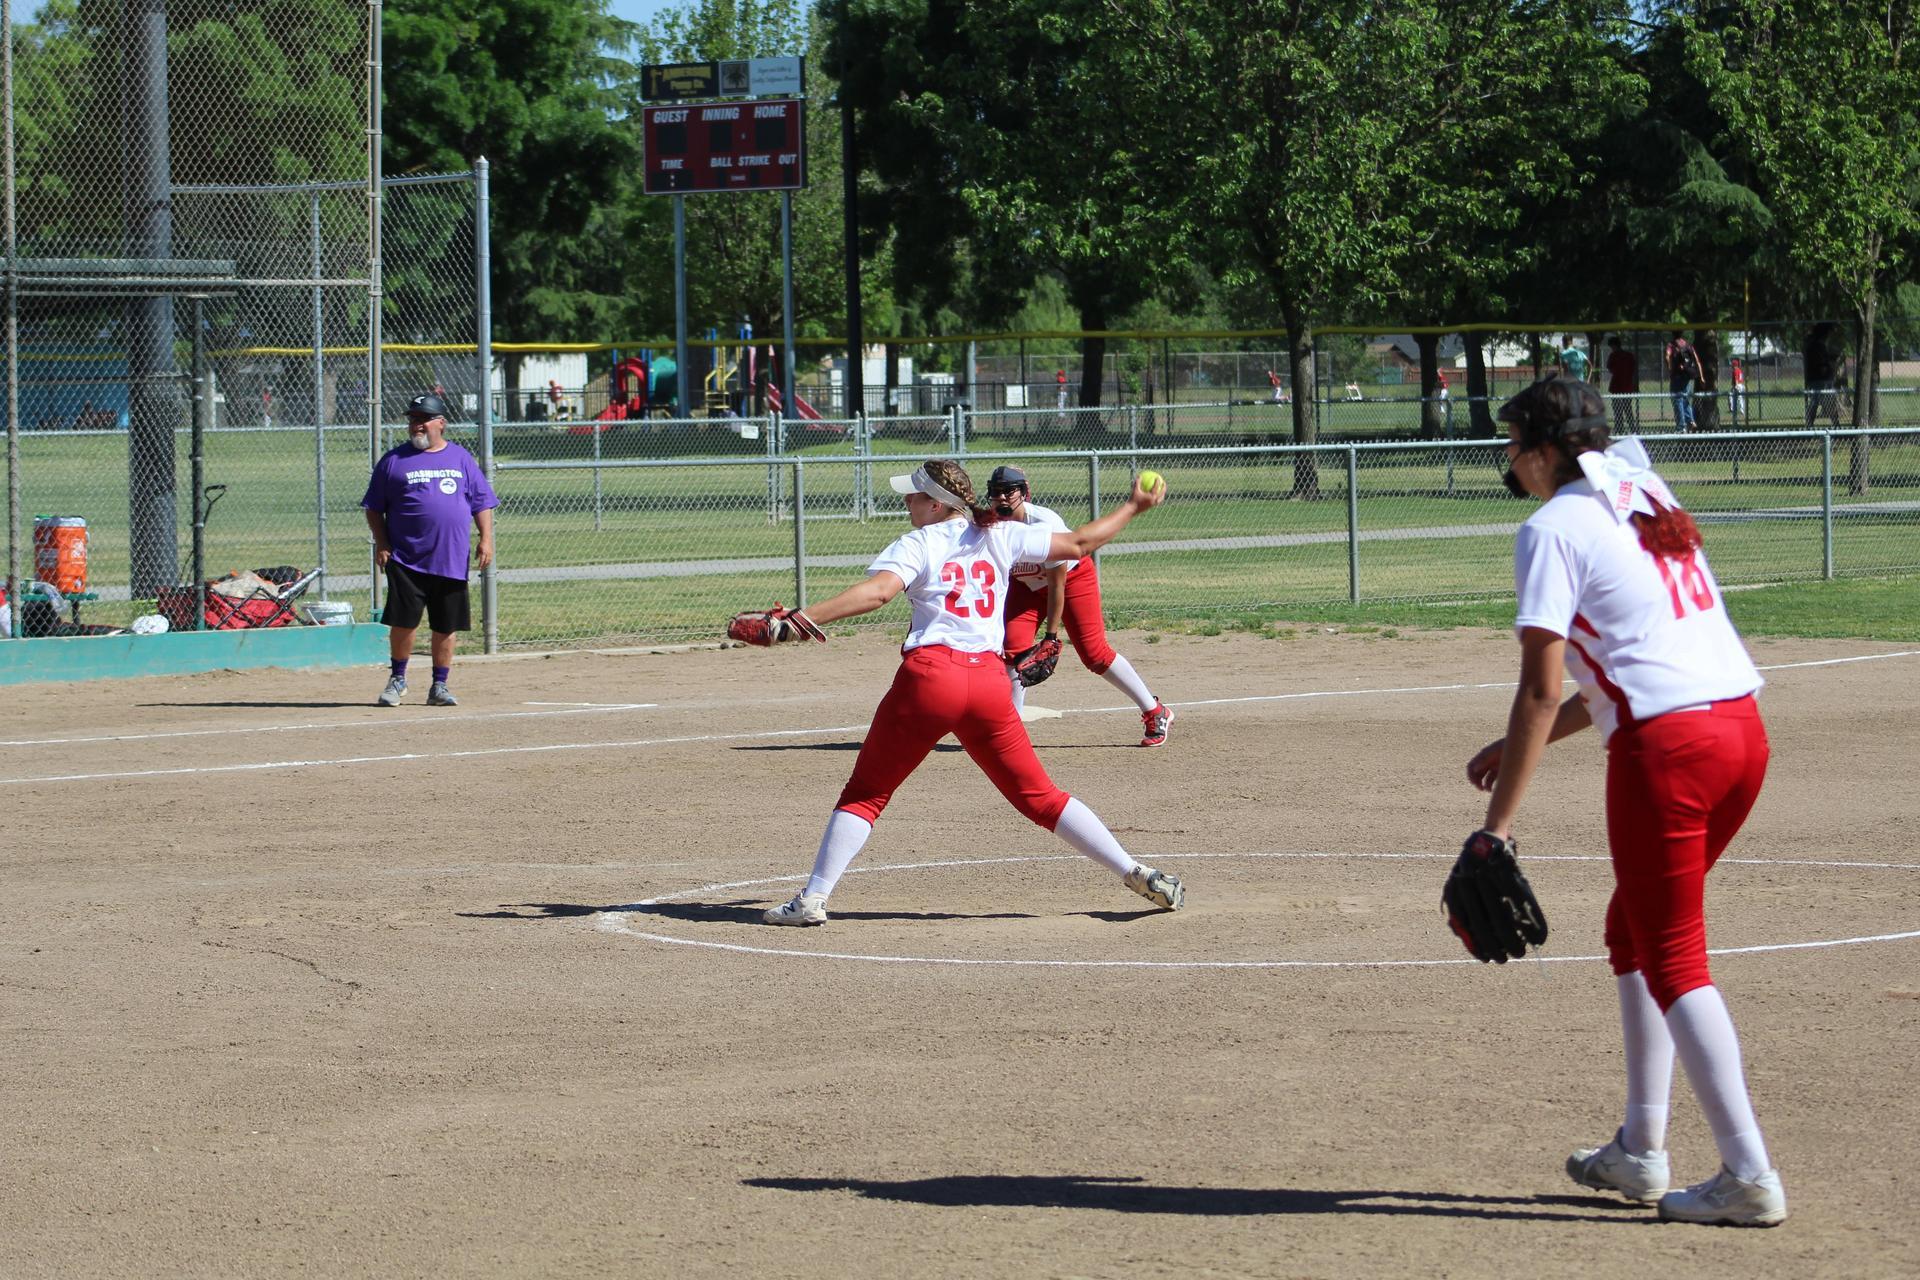 JV softball in action against Washington Union